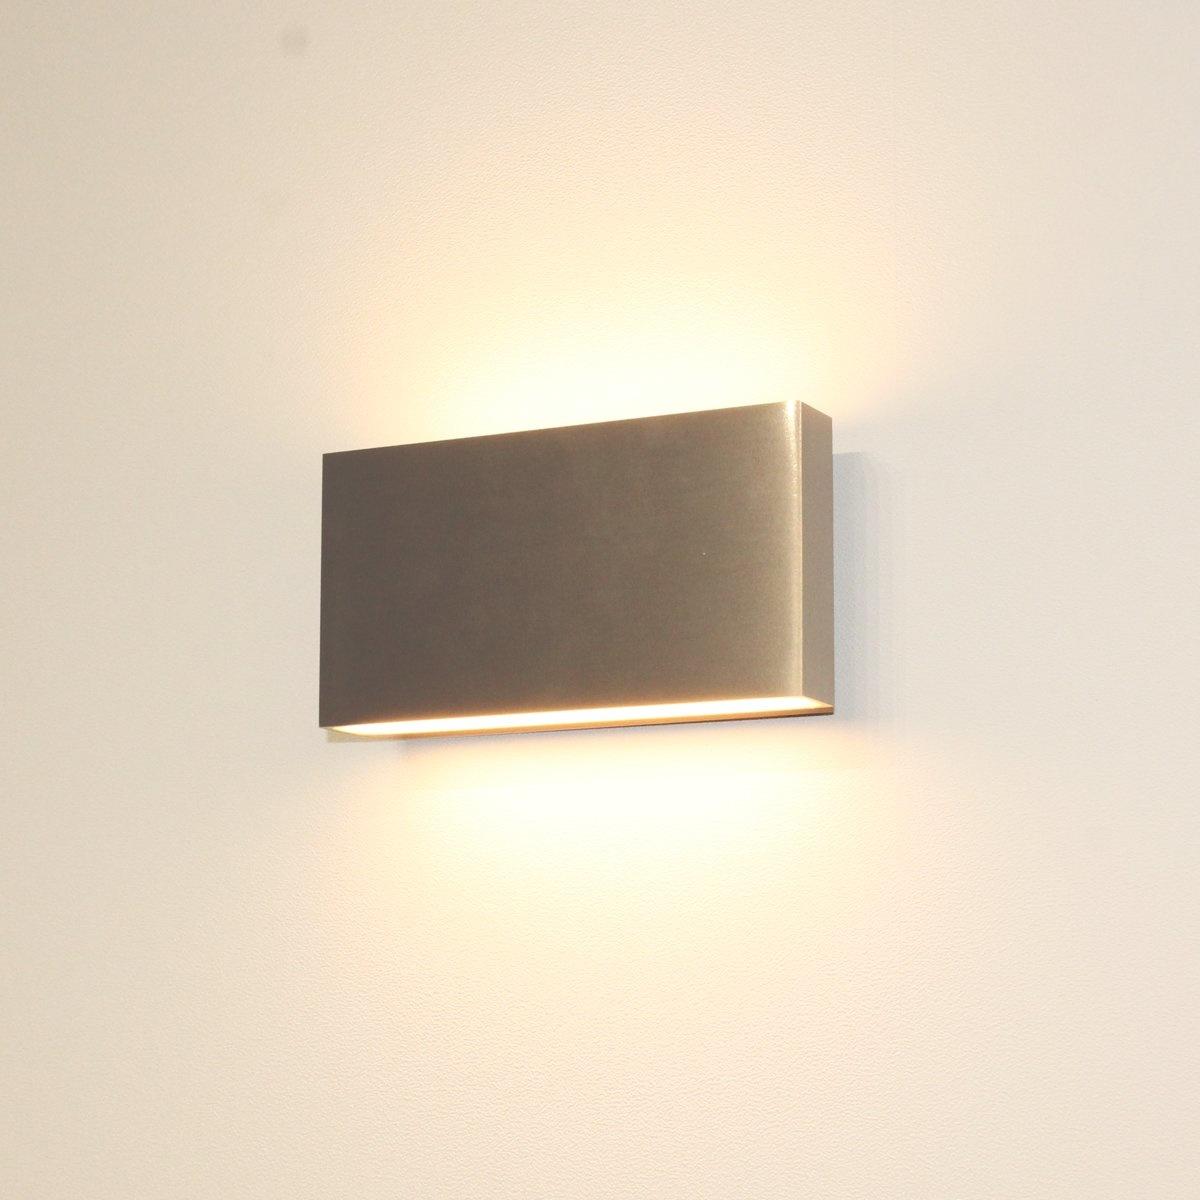 Artdelight Wandlamp Box L 17 cm H 9 cm mat chroom